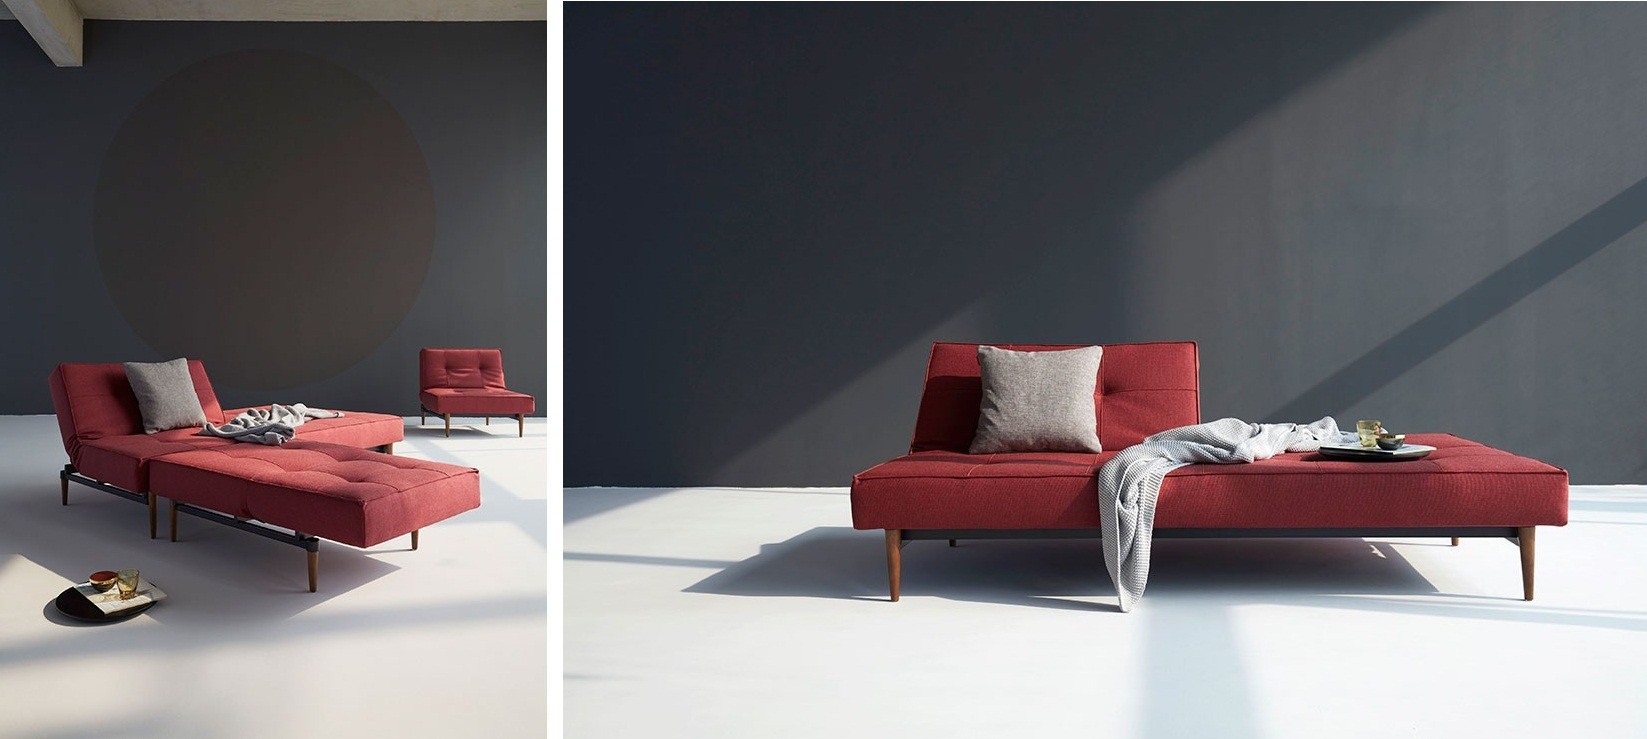 splitback-sofa-chair-521-twist-rust-red